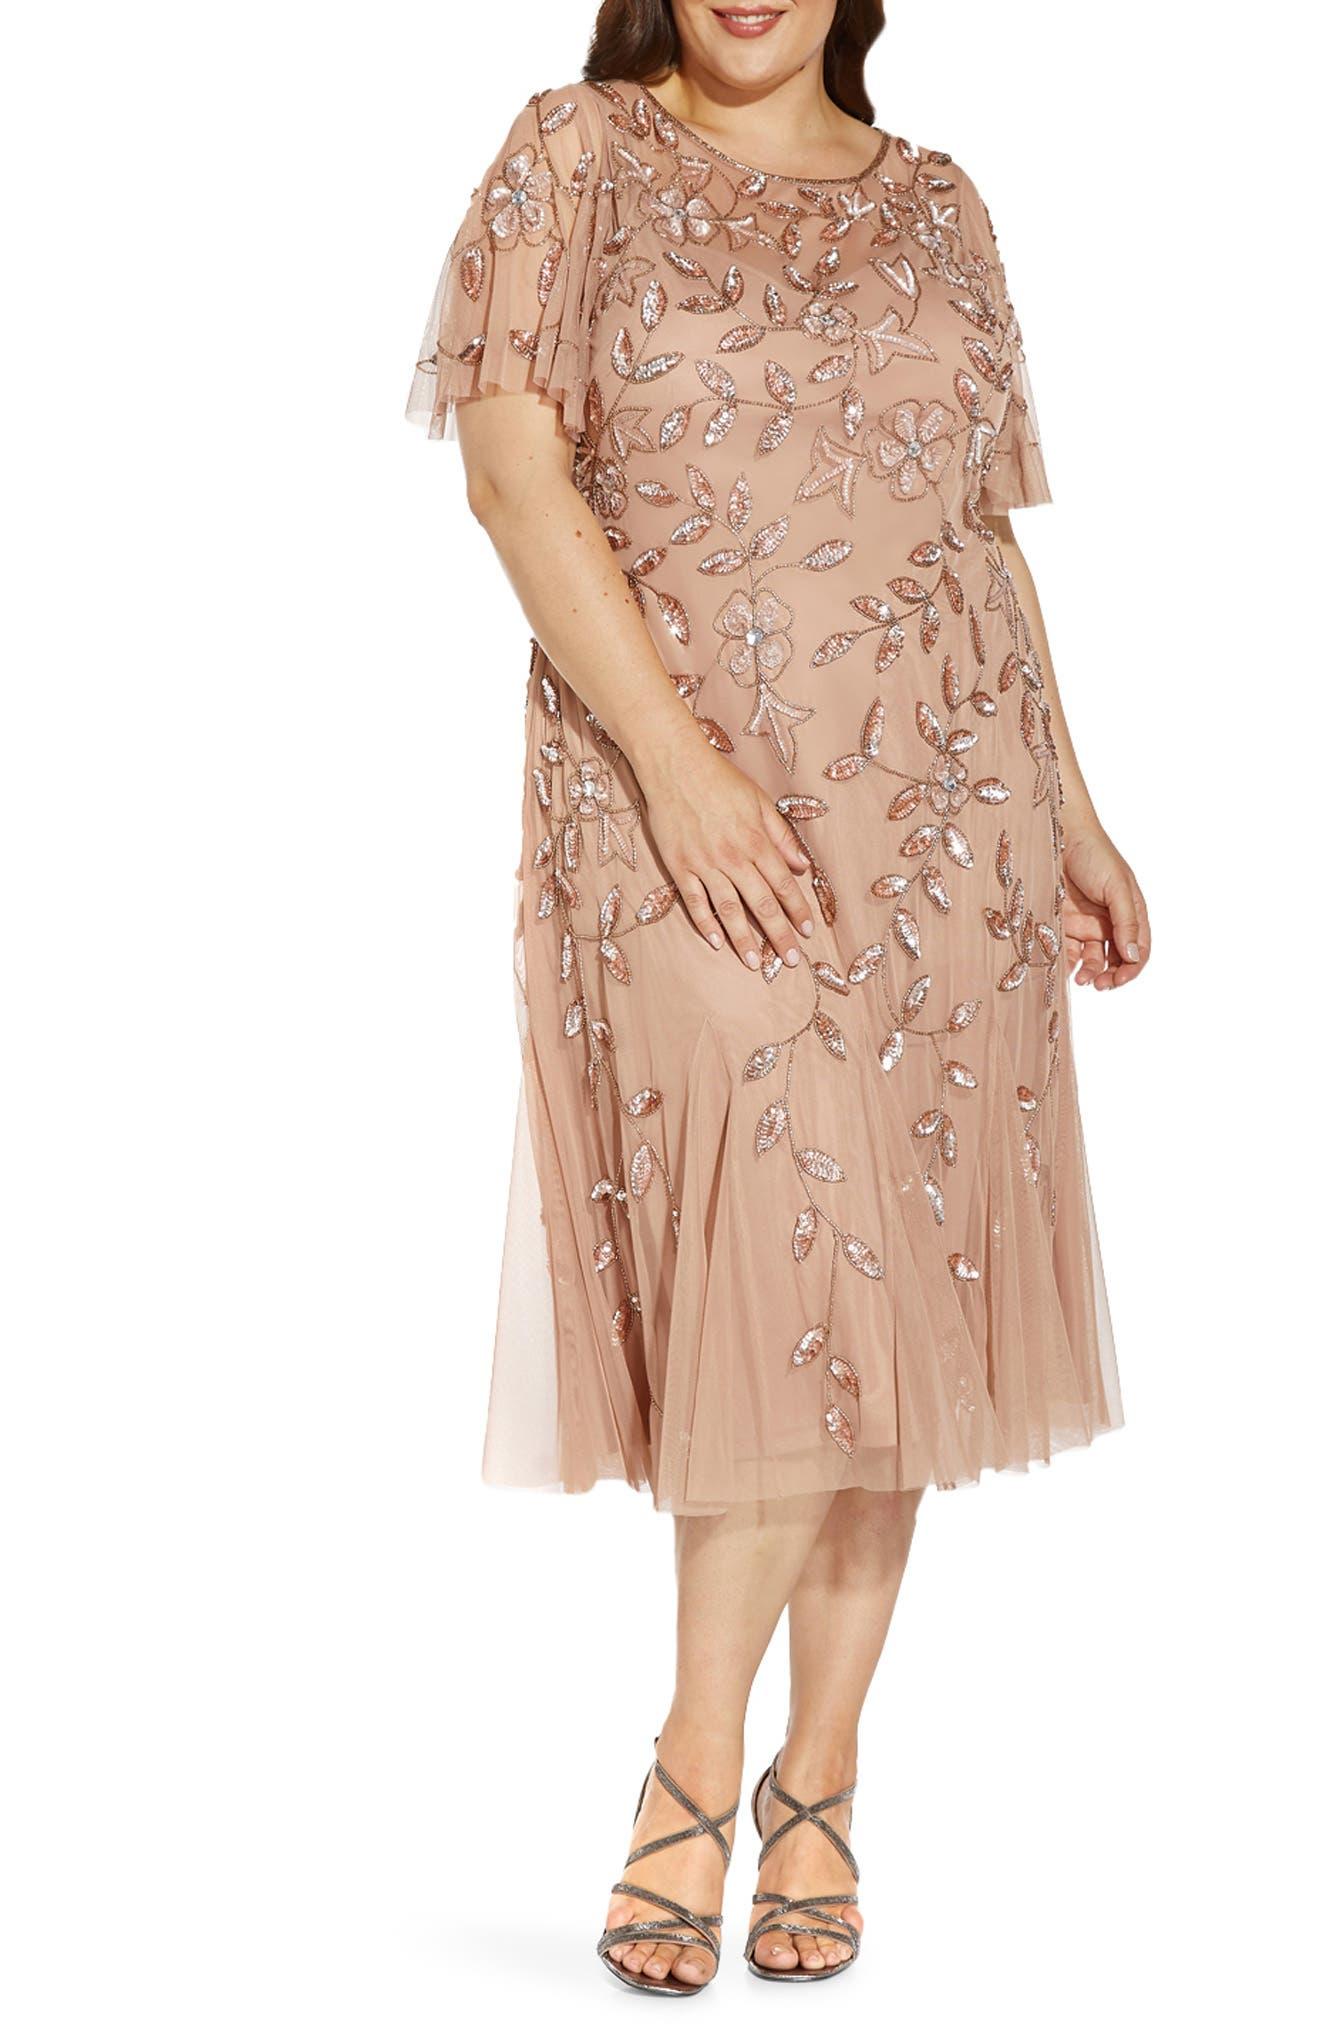 Charleston Dress: Fringe Flapper Dress Plus Size Womens Adrianna Papell Beaded Mesh Cocktail Dress Size 14W - Coral $299.00 AT vintagedancer.com